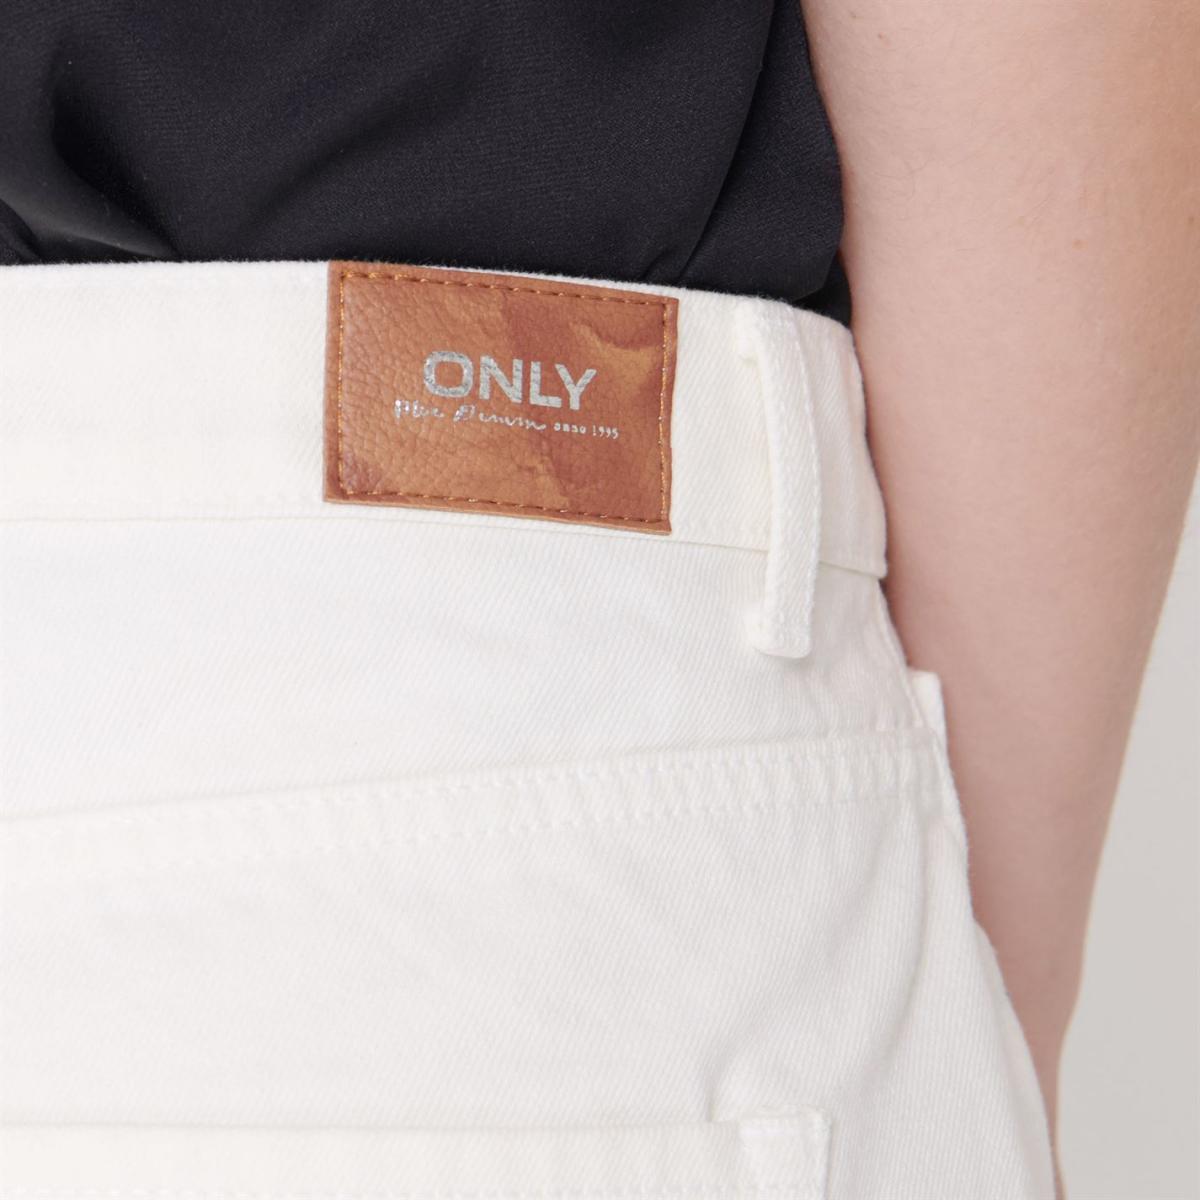 Only-Damen-Kurzhose-Shorts-Damenhose-Sporthose-Bermuda-Sommer-7093 Indexbild 11